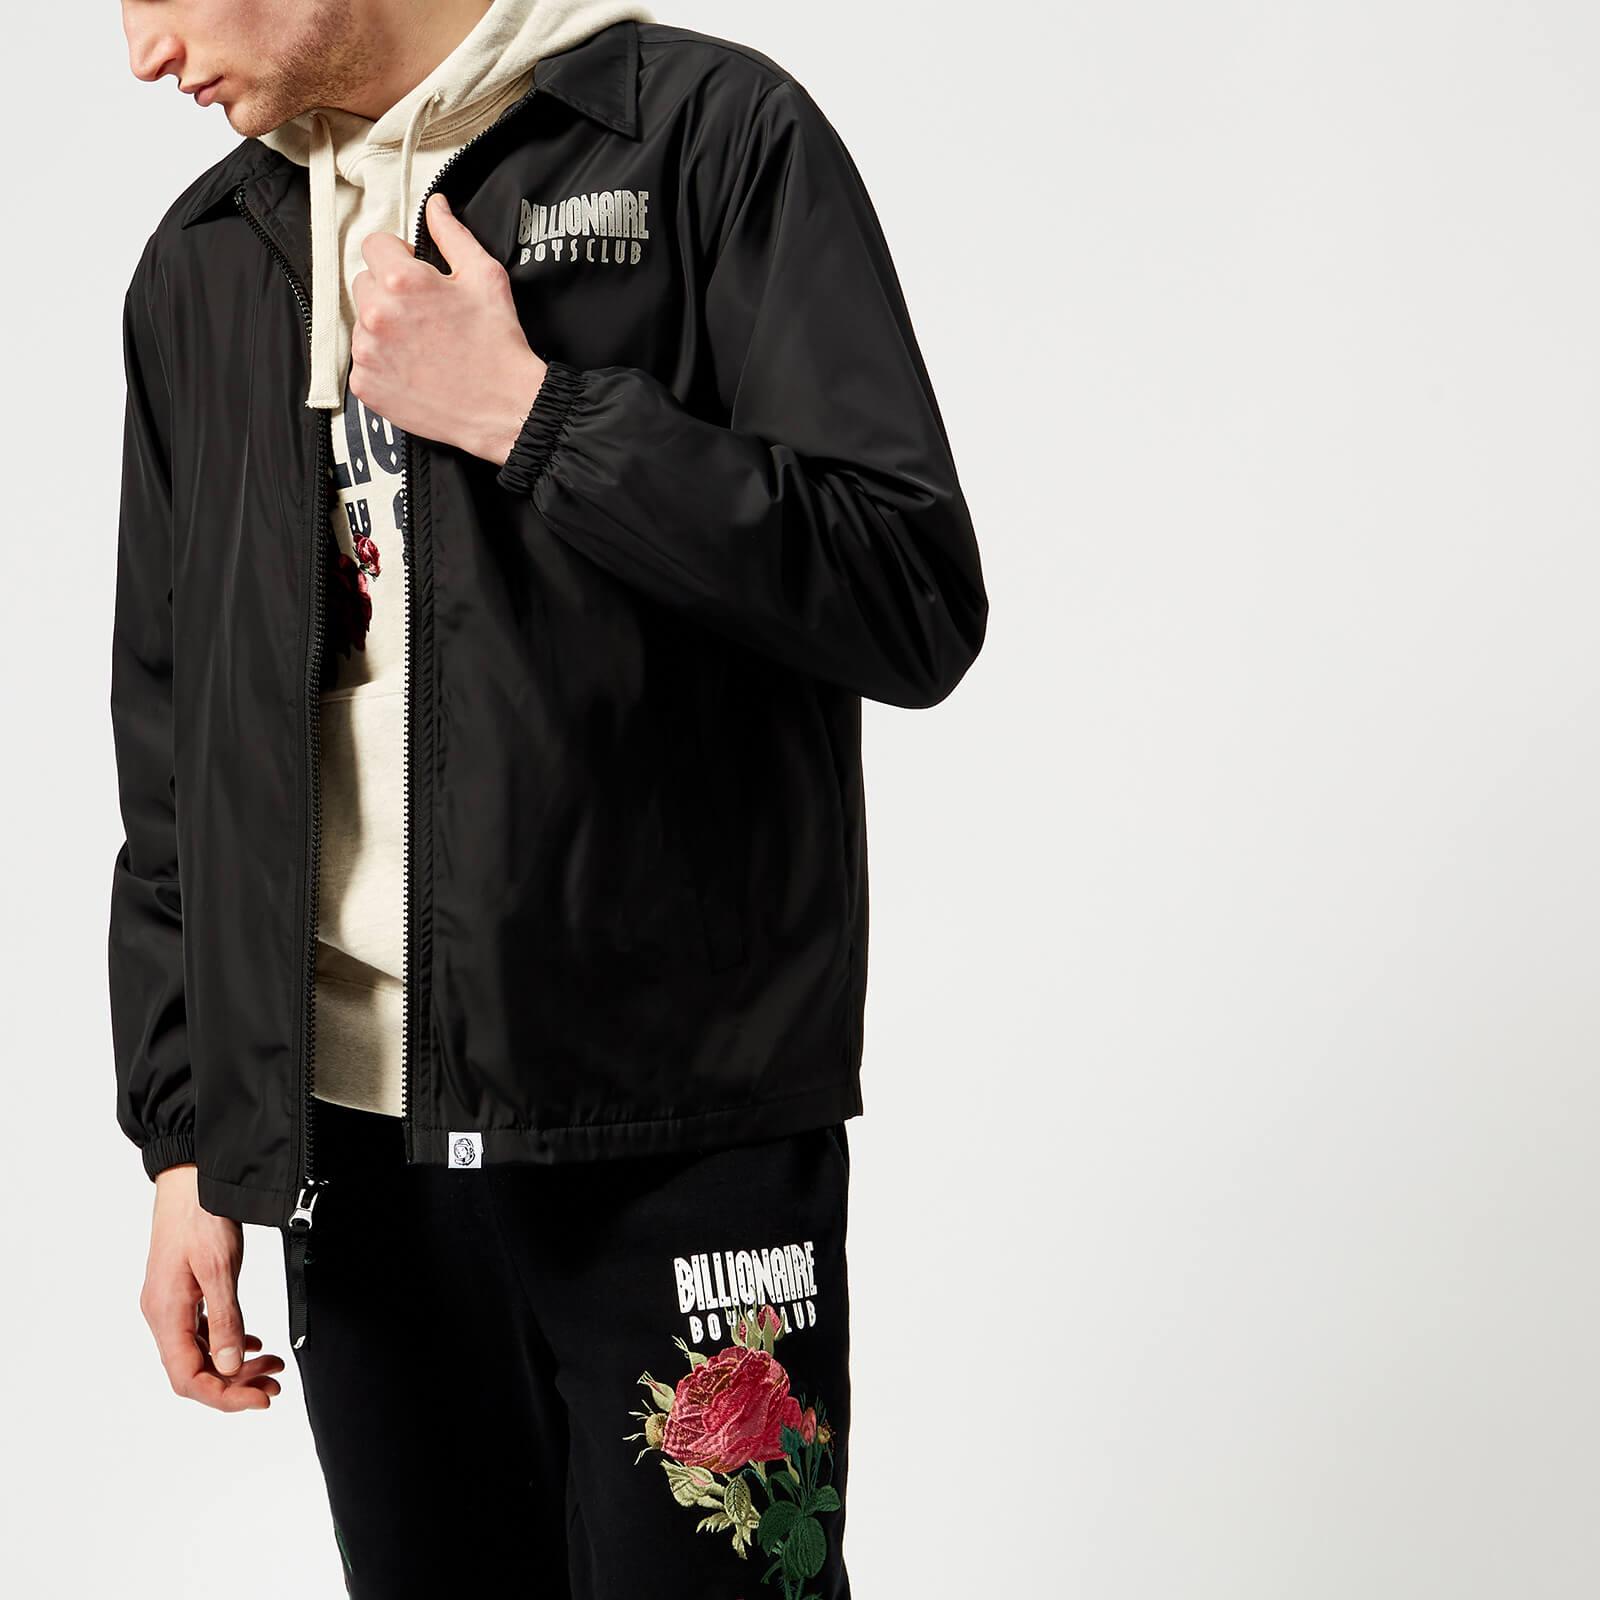 35a1794ea Billionaire Boys Club Men's Zip Coach Jacket - Black - Free UK Delivery  over £50